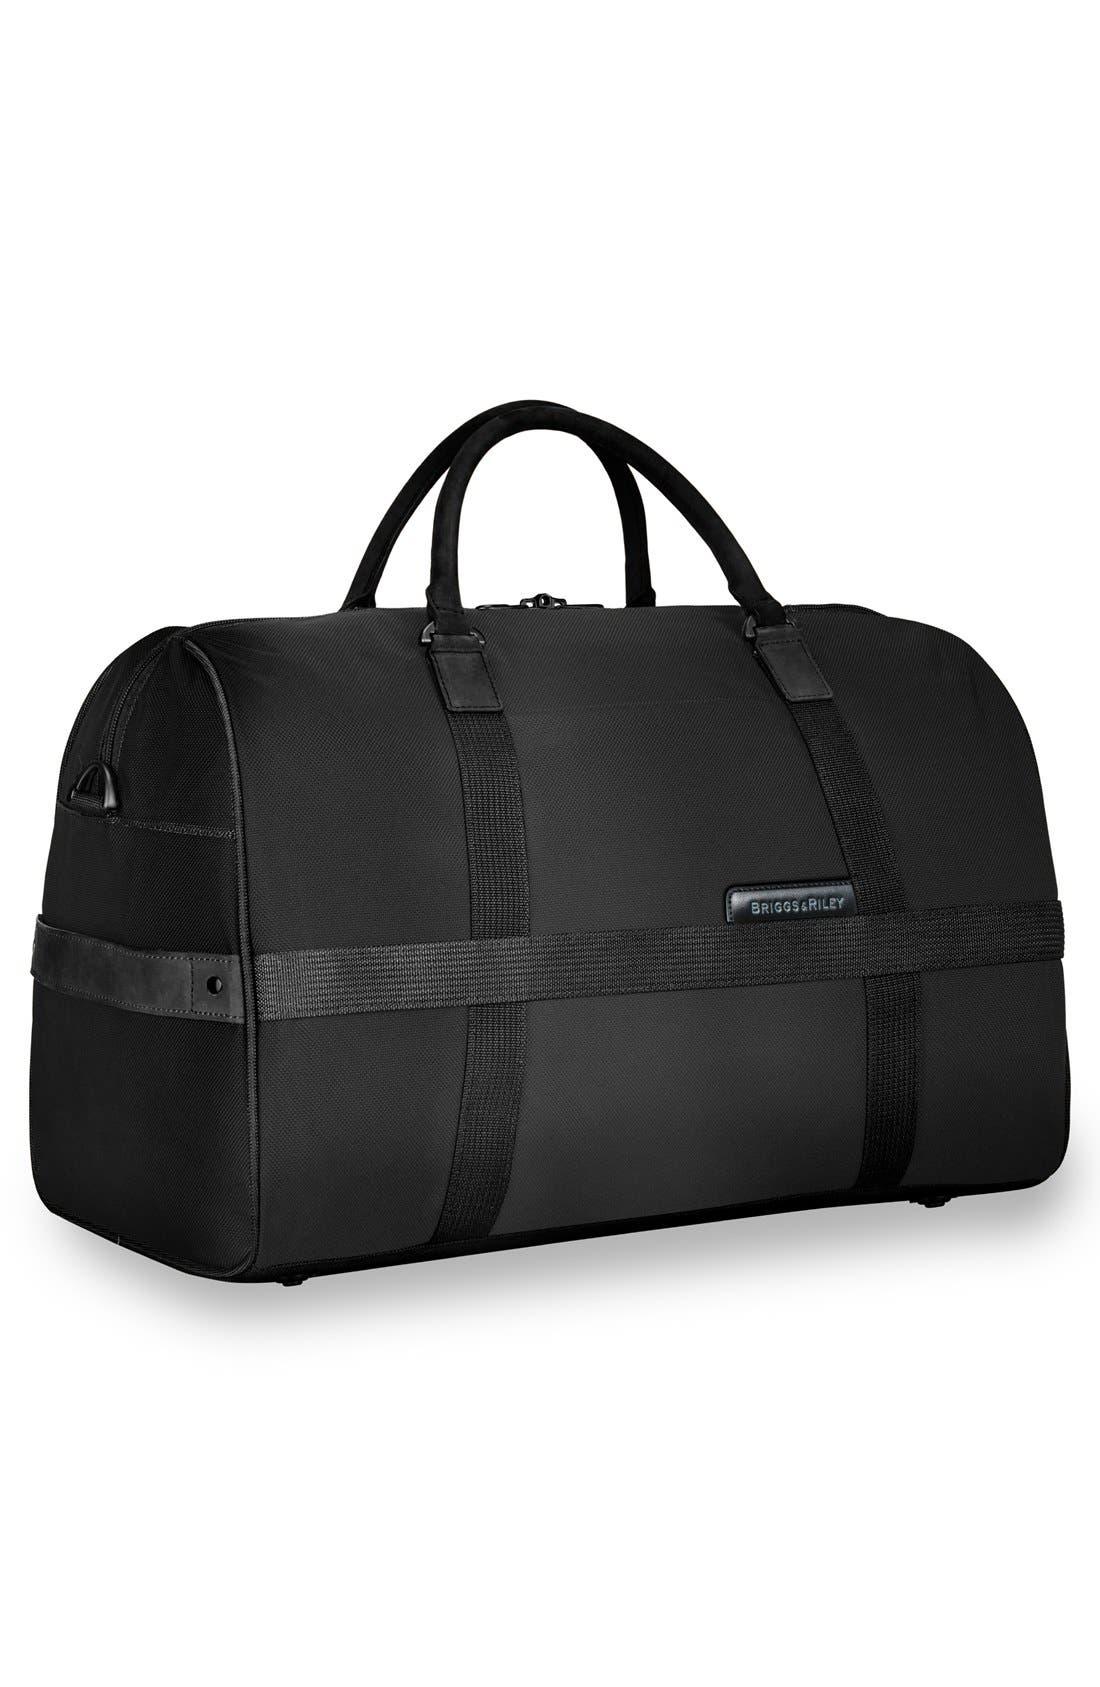 'Baseline - Medium' Duffel Bag,                             Alternate thumbnail 4, color,